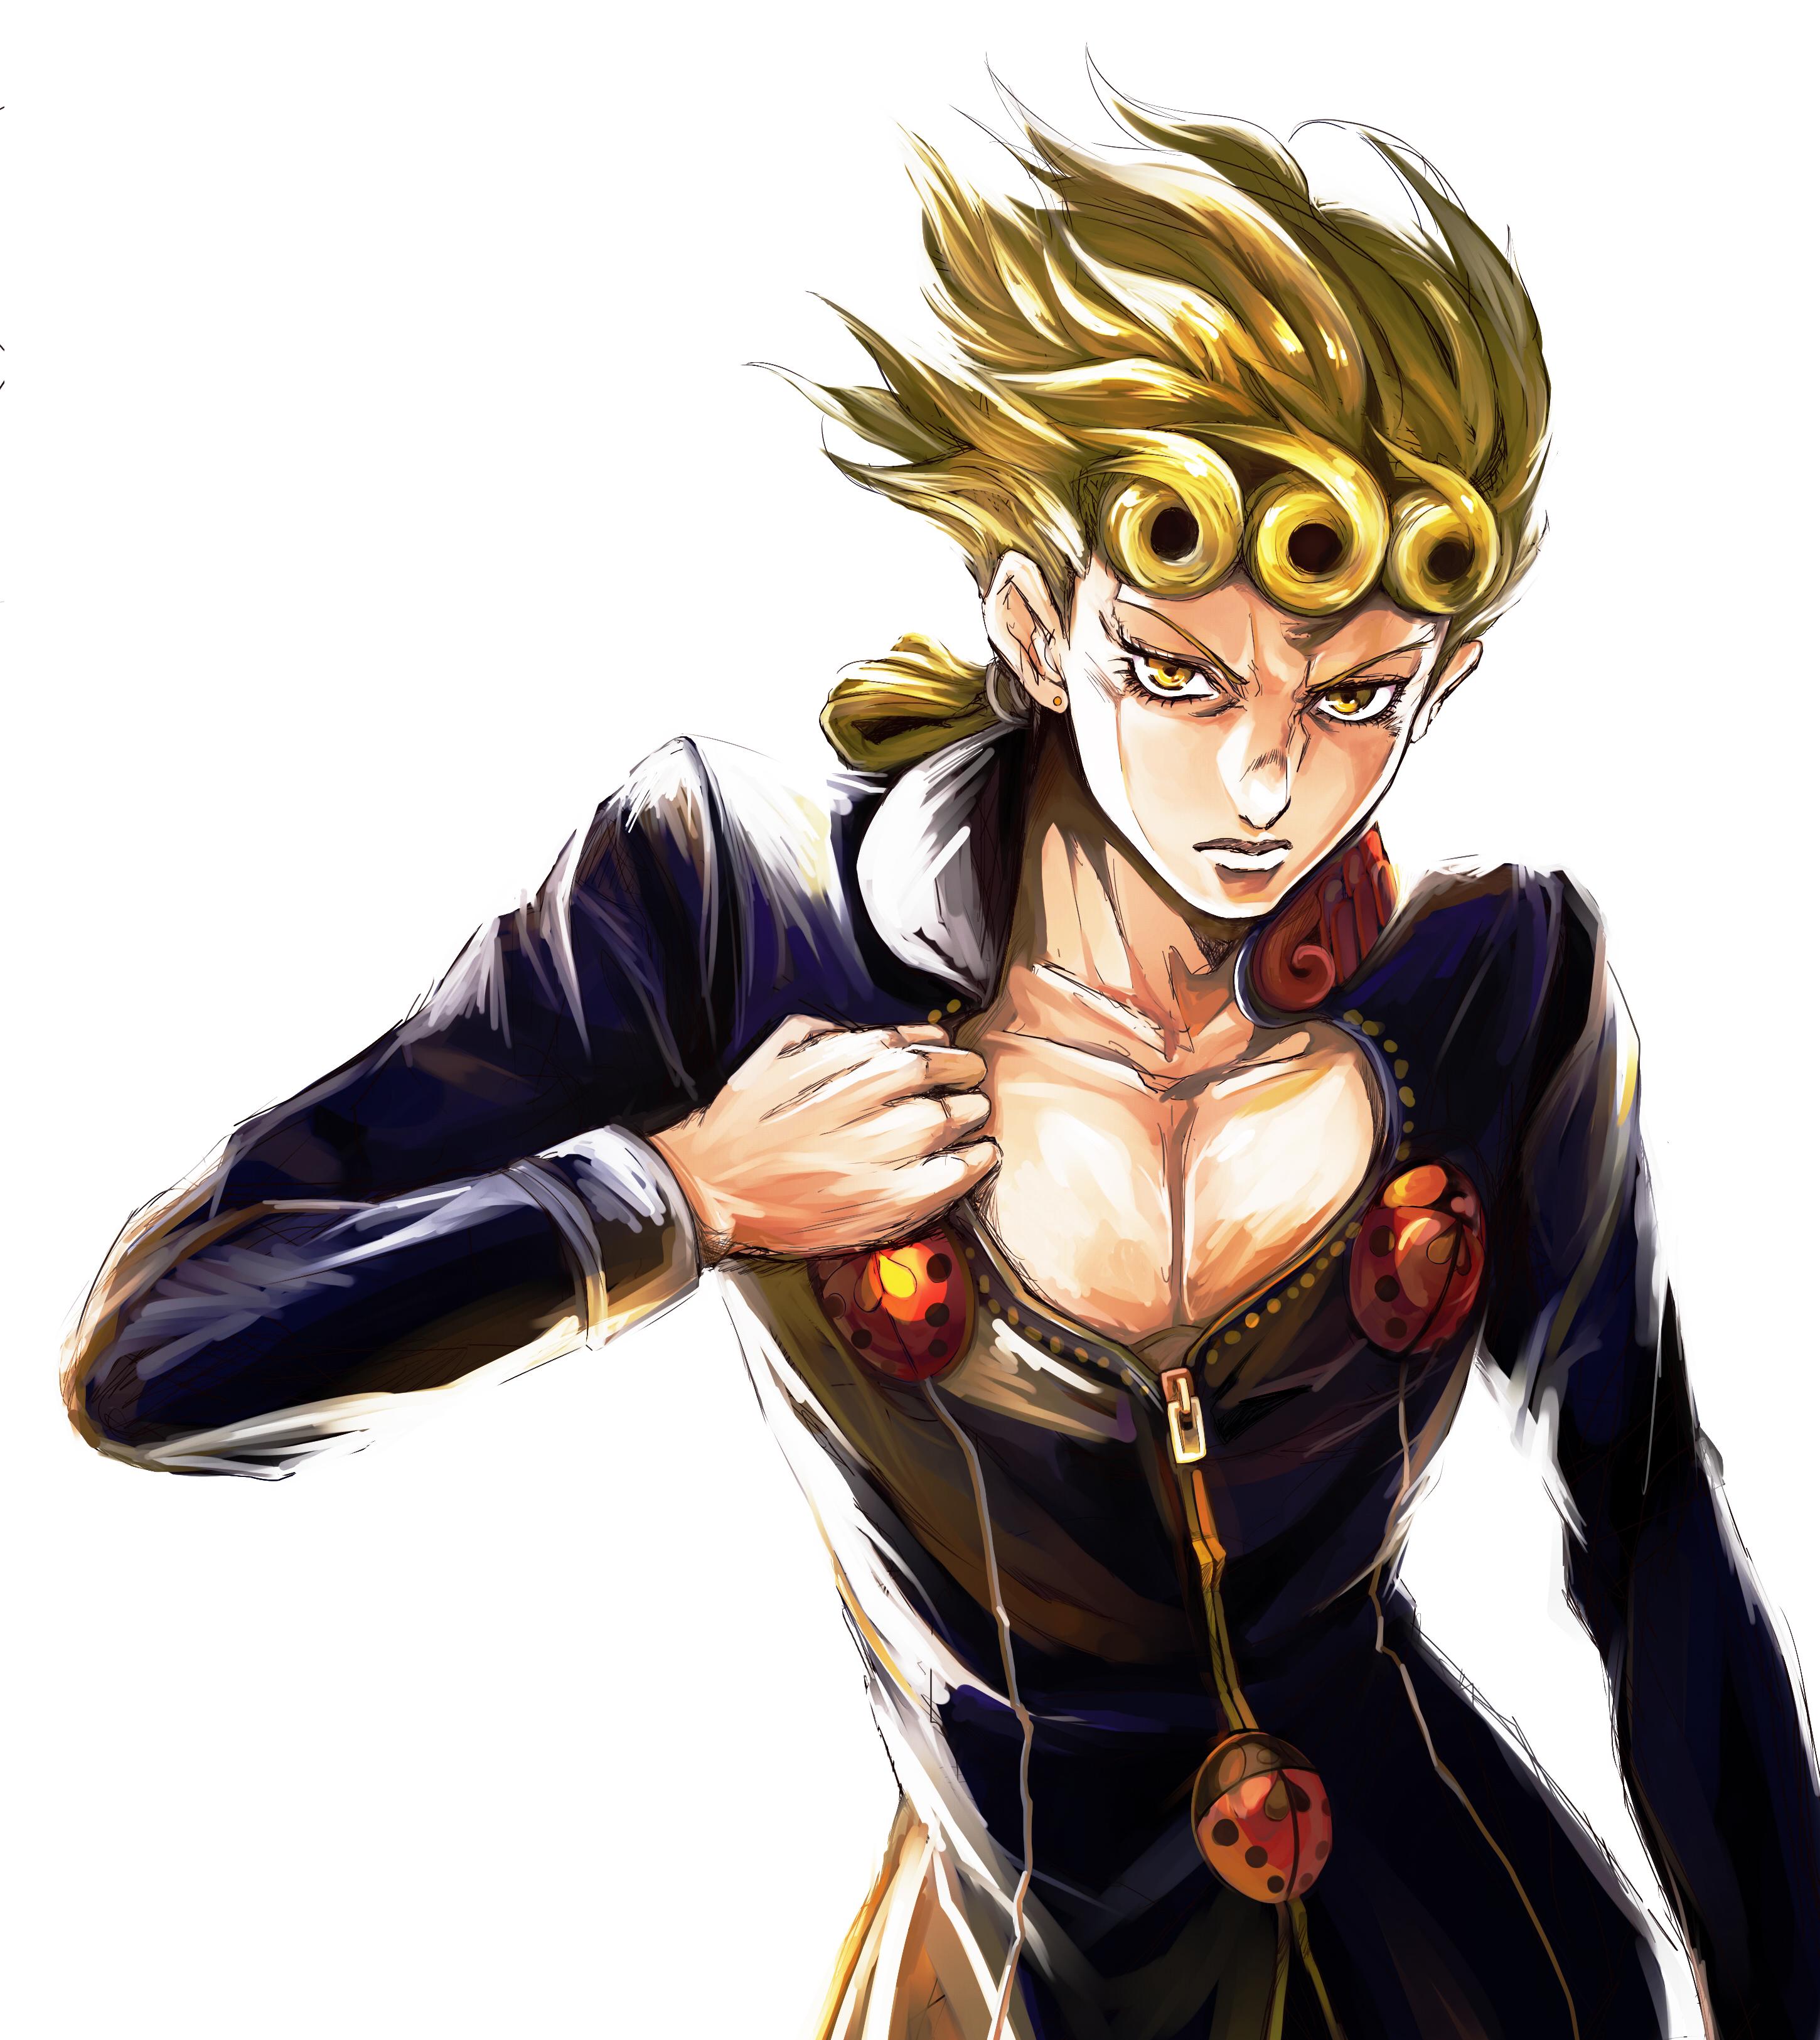 Giorno Giovanna Vento Aureo Zerochan Anime Image Board